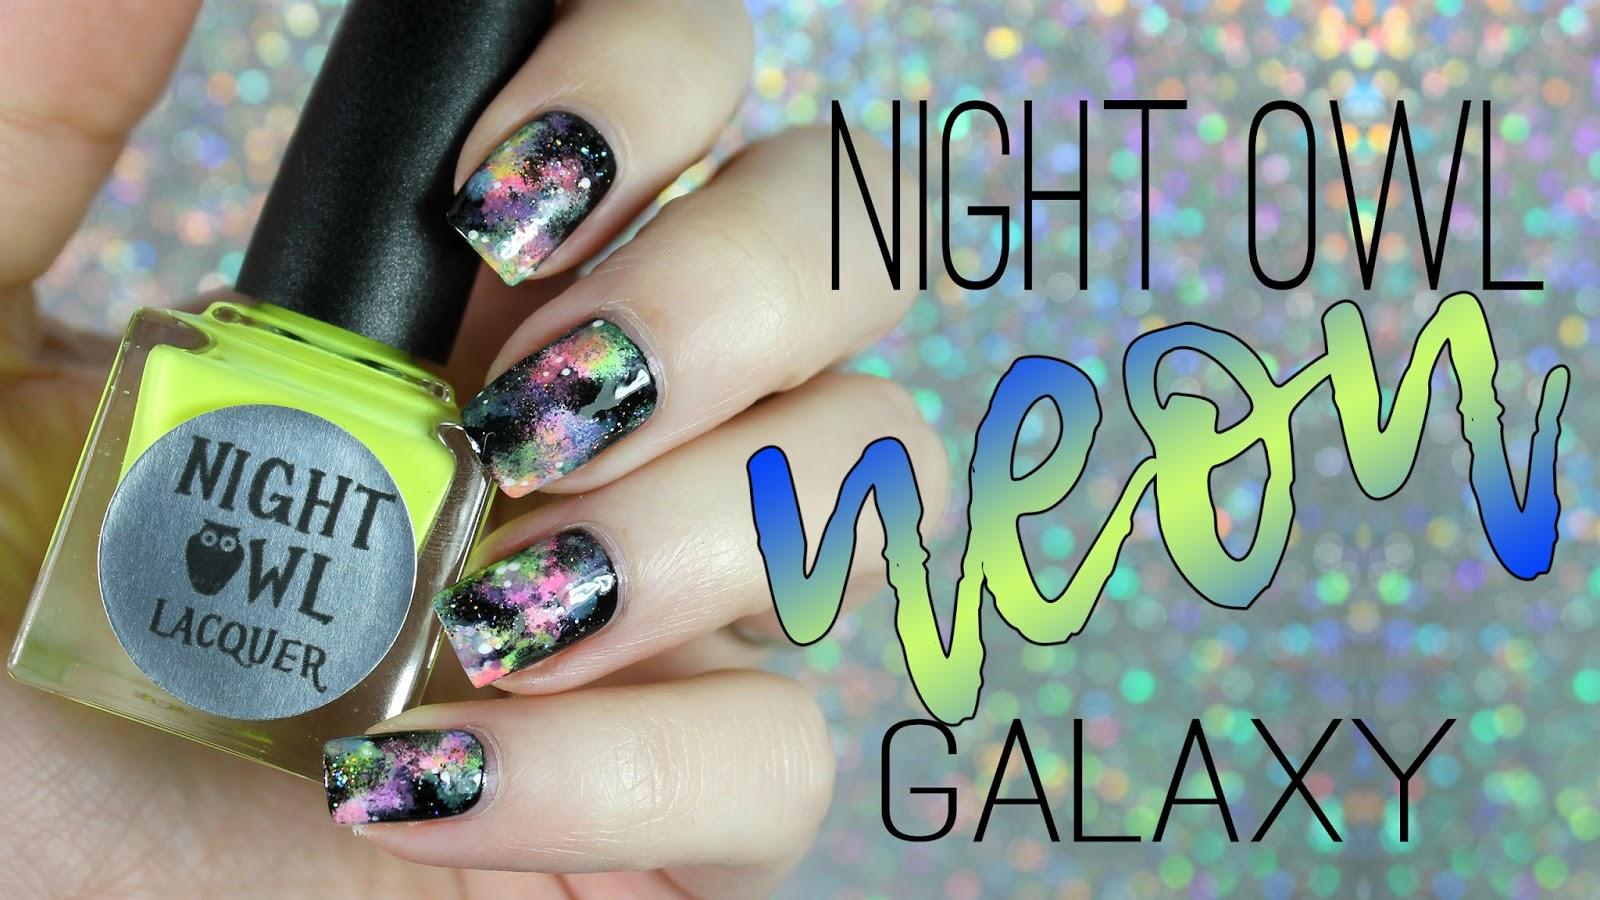 Bedlam Beauty: Night Owl Lacquer Neon Galaxy Nail Art